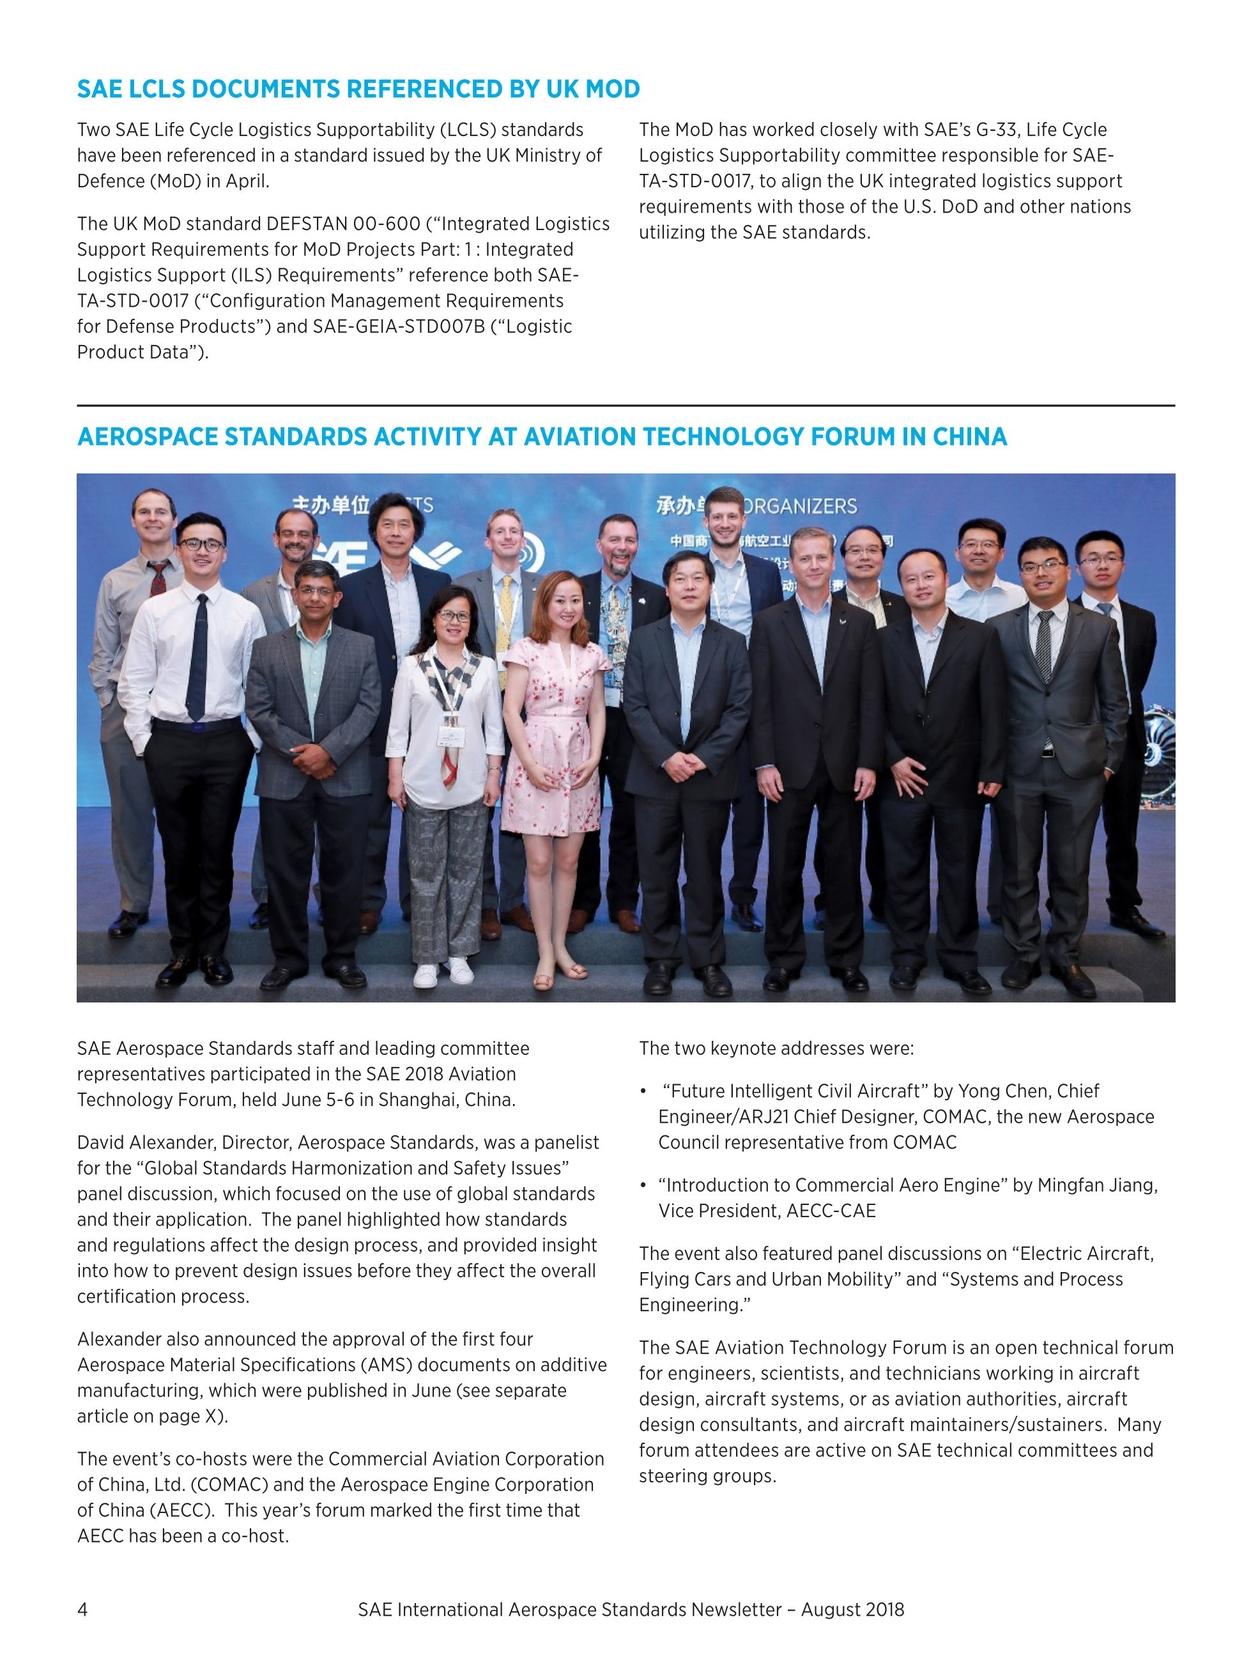 Aerospace Standards Newsletter - August 2018